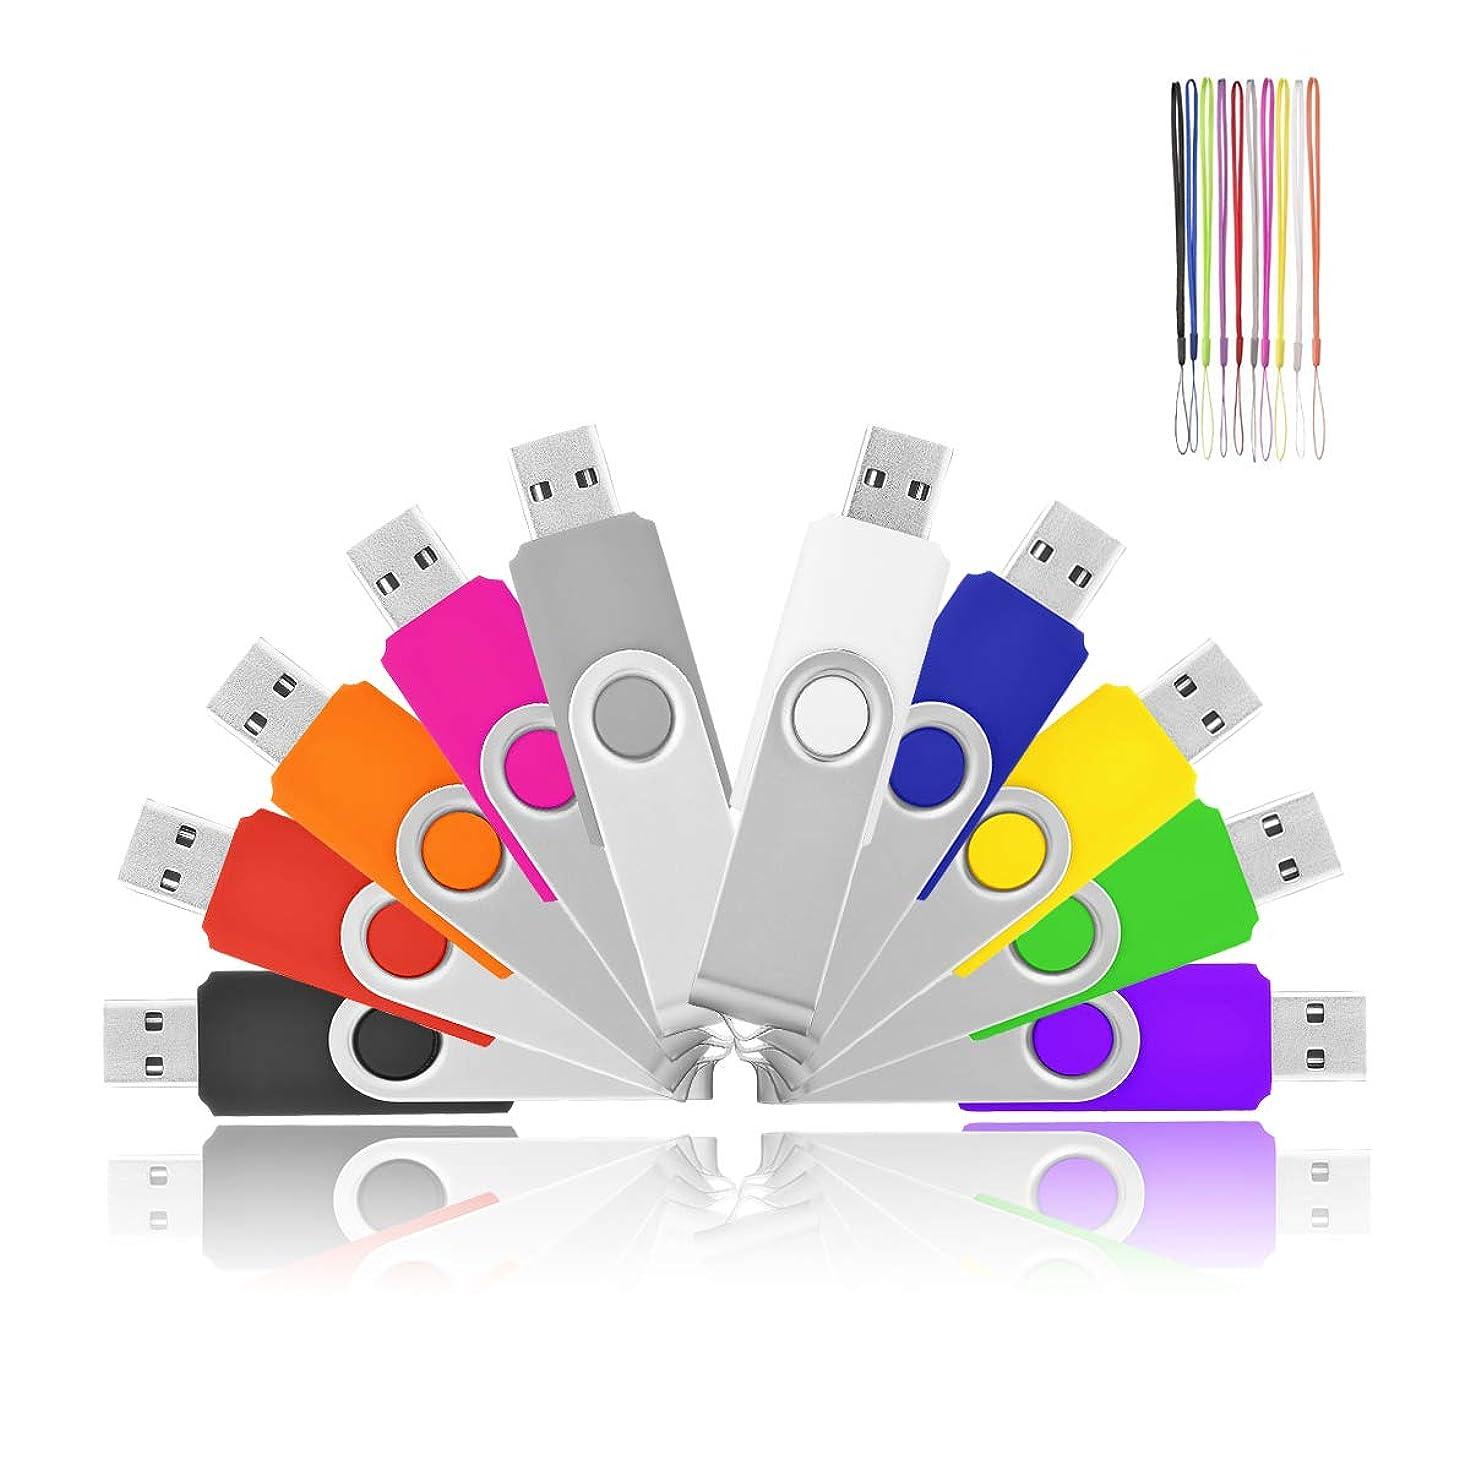 HKUU 10 Pack Flash Drive 32GB USB 2.0 Memory Stick Fold Storage Thumb Stick Pen Zip Drive Bulk(Black/Grey/White/Yellow/Red/Pink/Orange/Green/Blue/Purple)